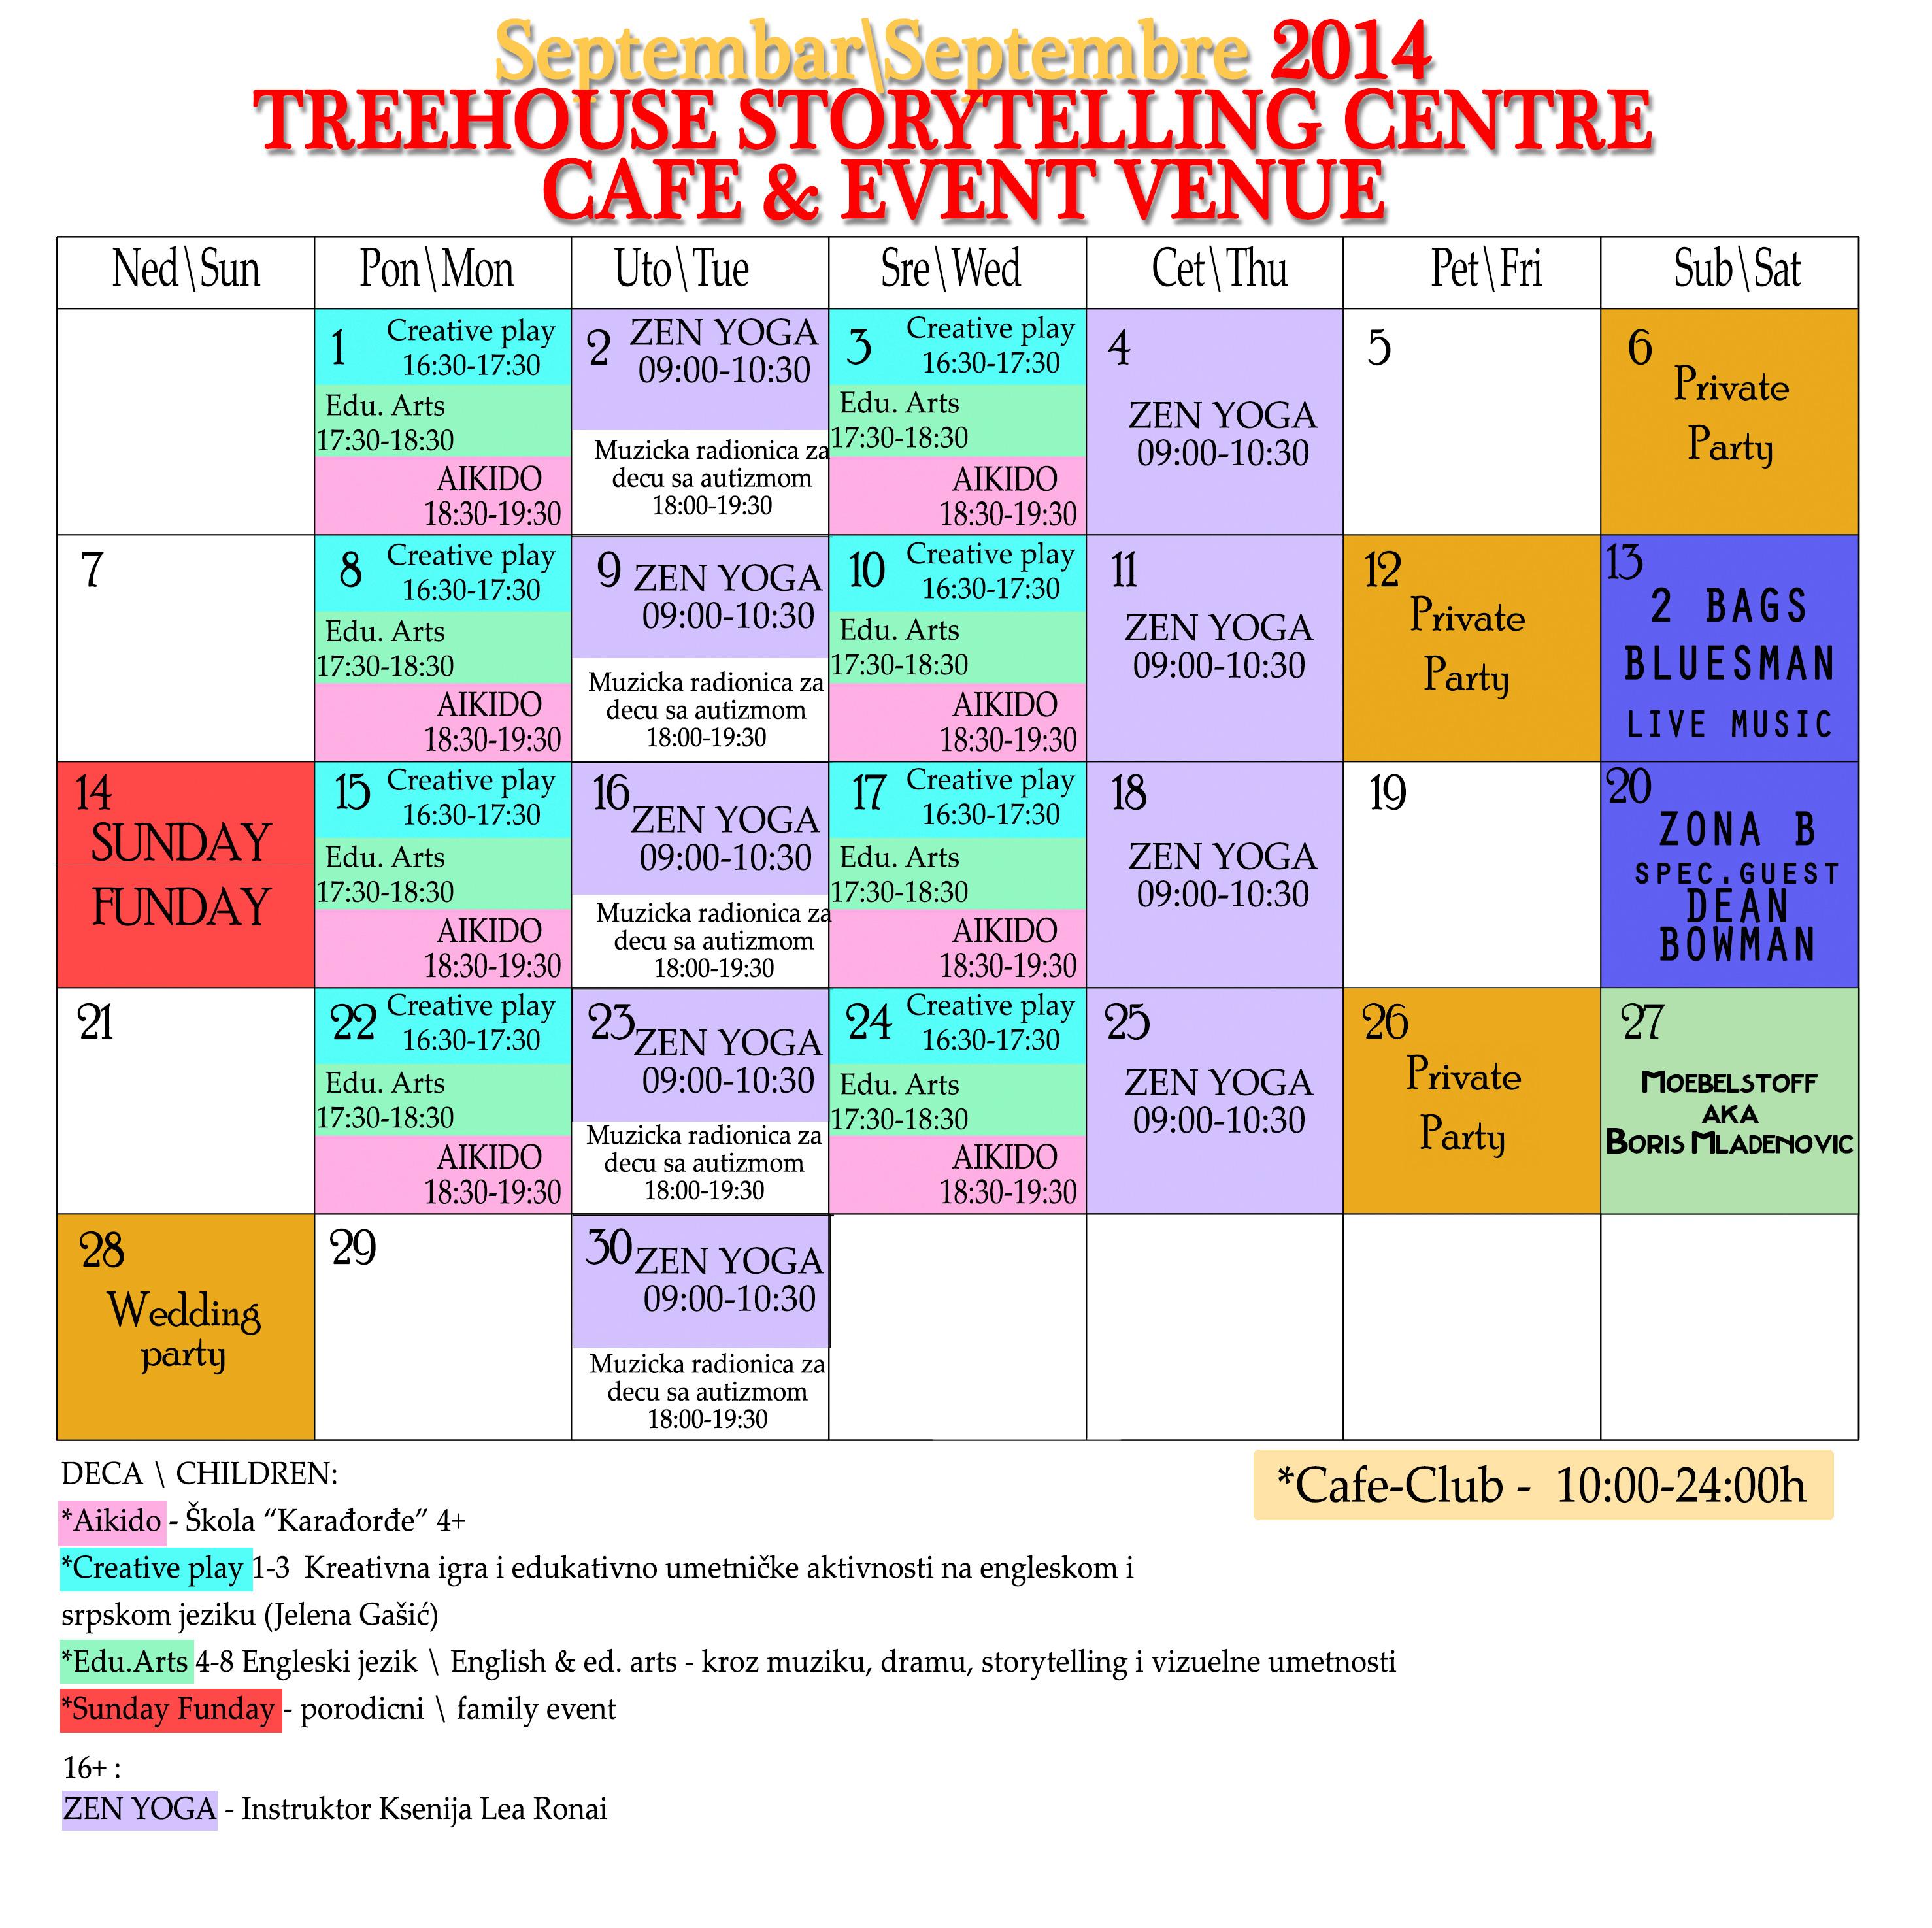 http://www.treehousesc.com/wp-content/uploads/2014/09/kalendar-sep4Moebl.jpg